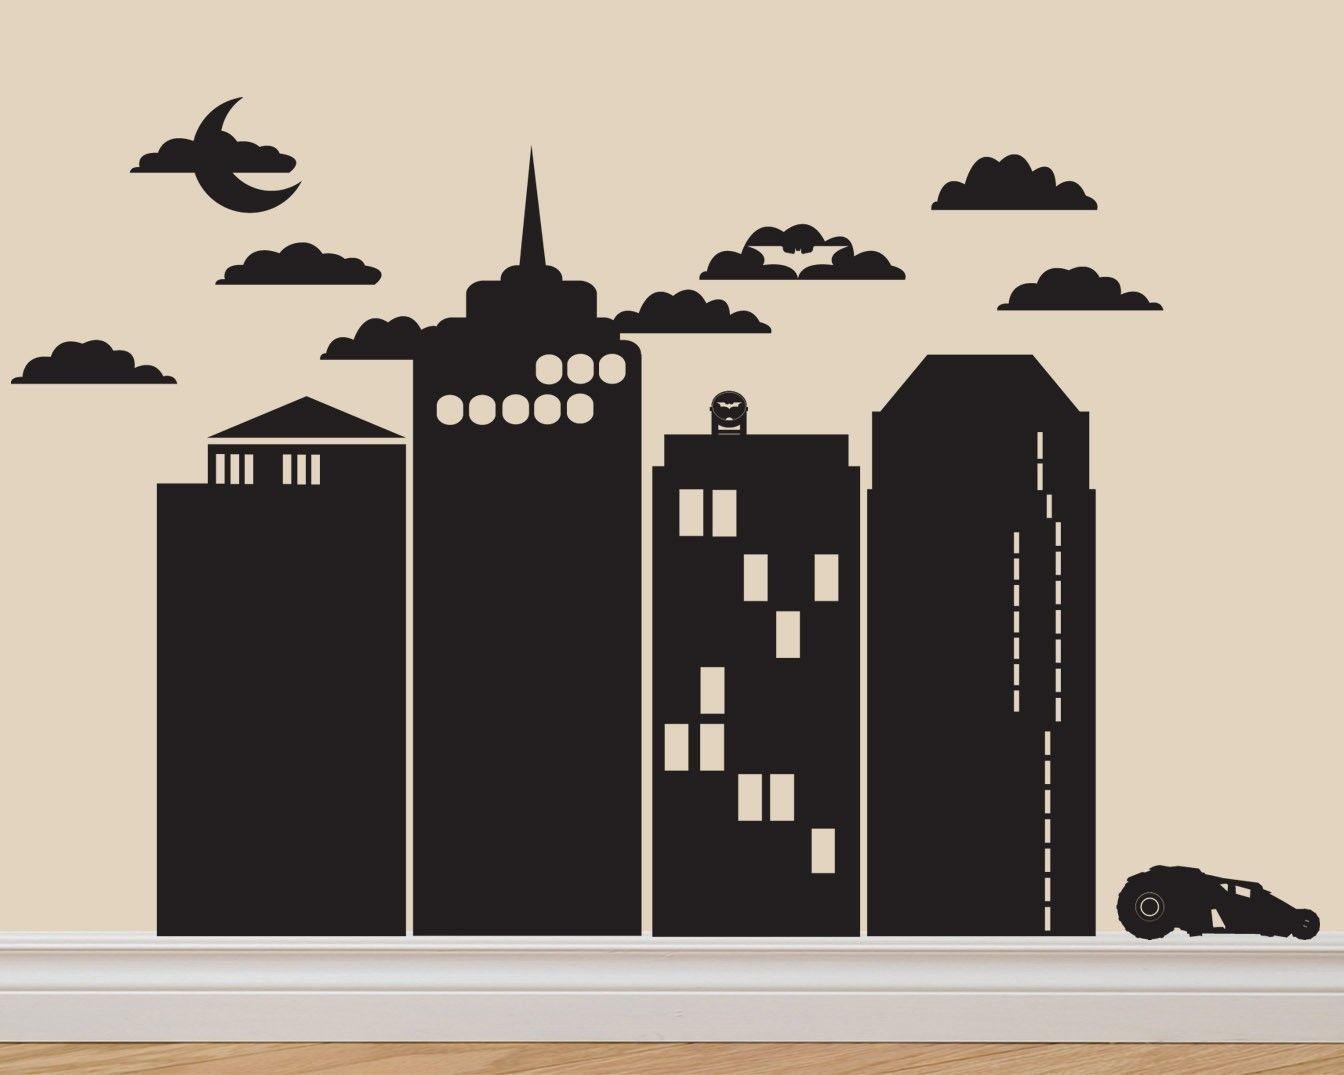 Gotham City Batman Vinyl Decal Sticker Original Graphics By - Batman vinyl decal stickers